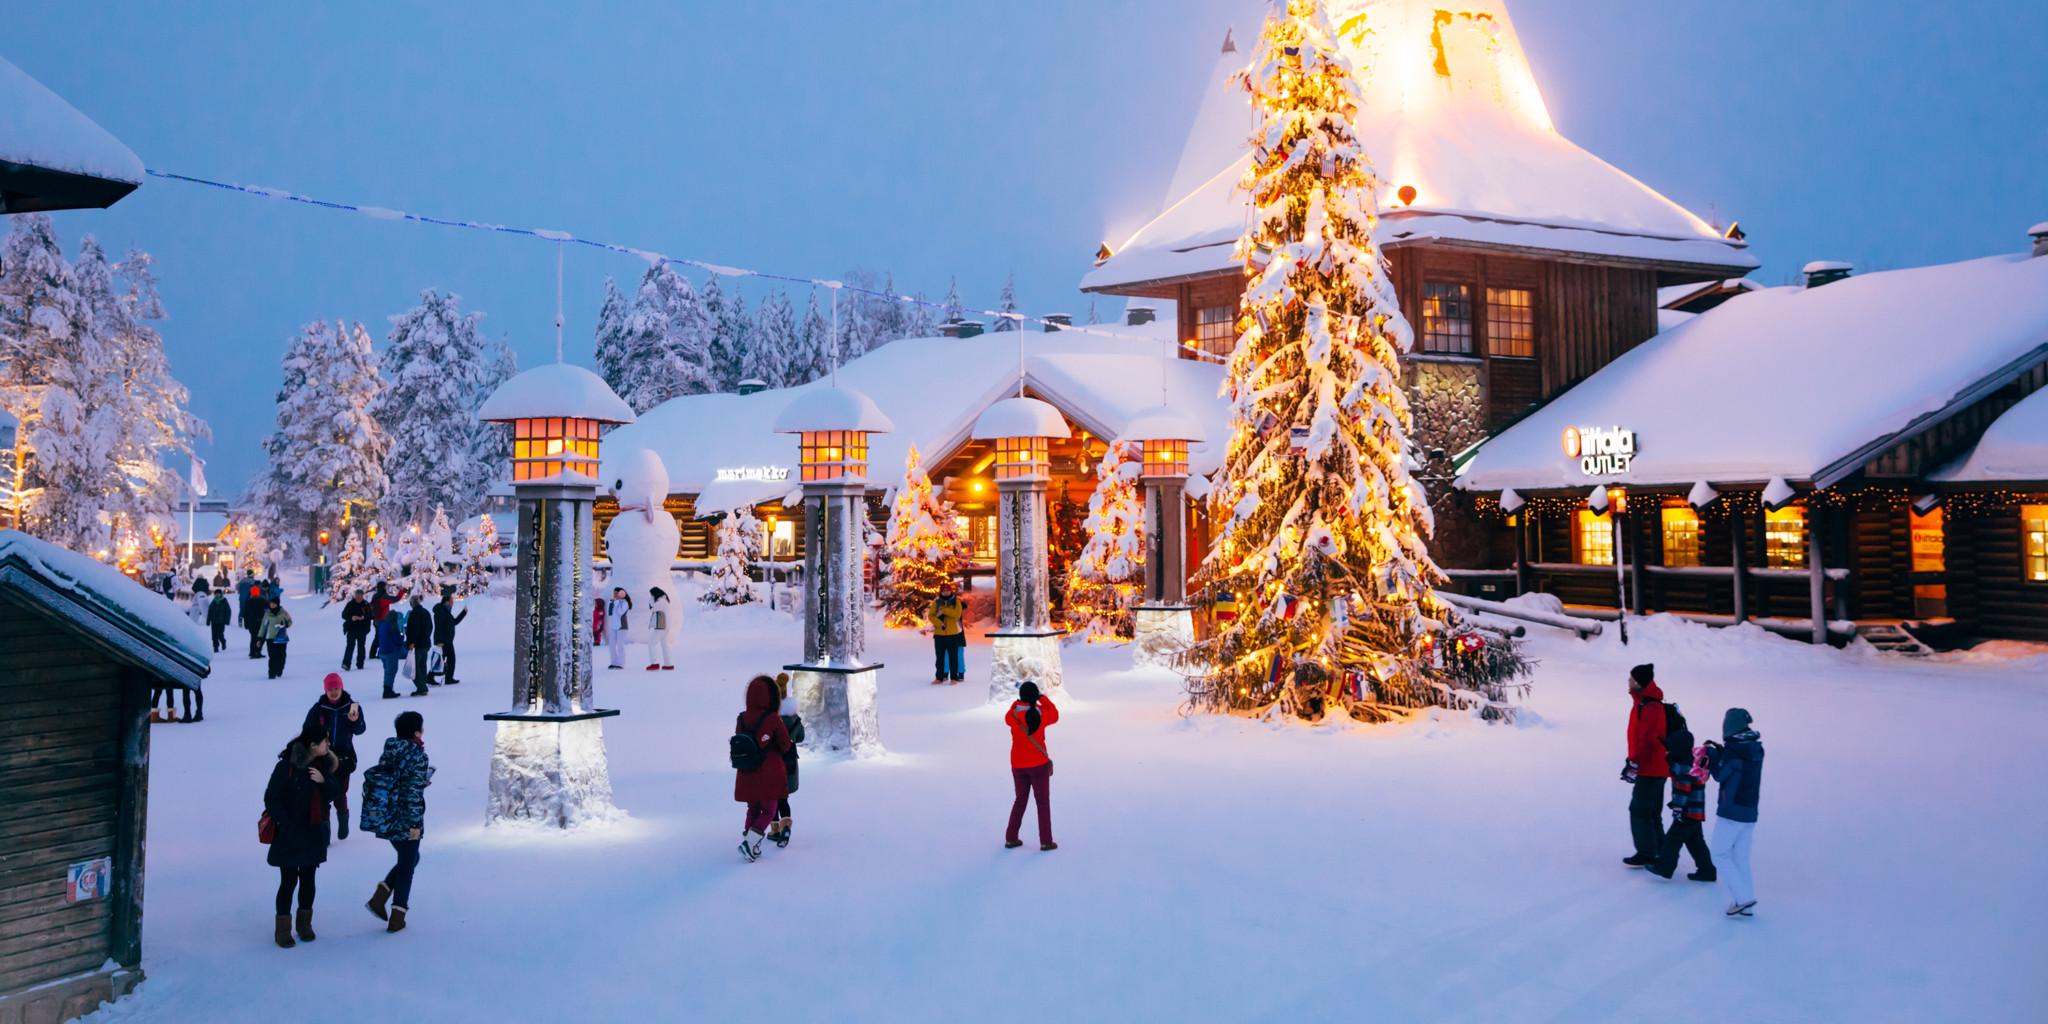 visit-rovaniemi-sights-attractions-santa-claus-village